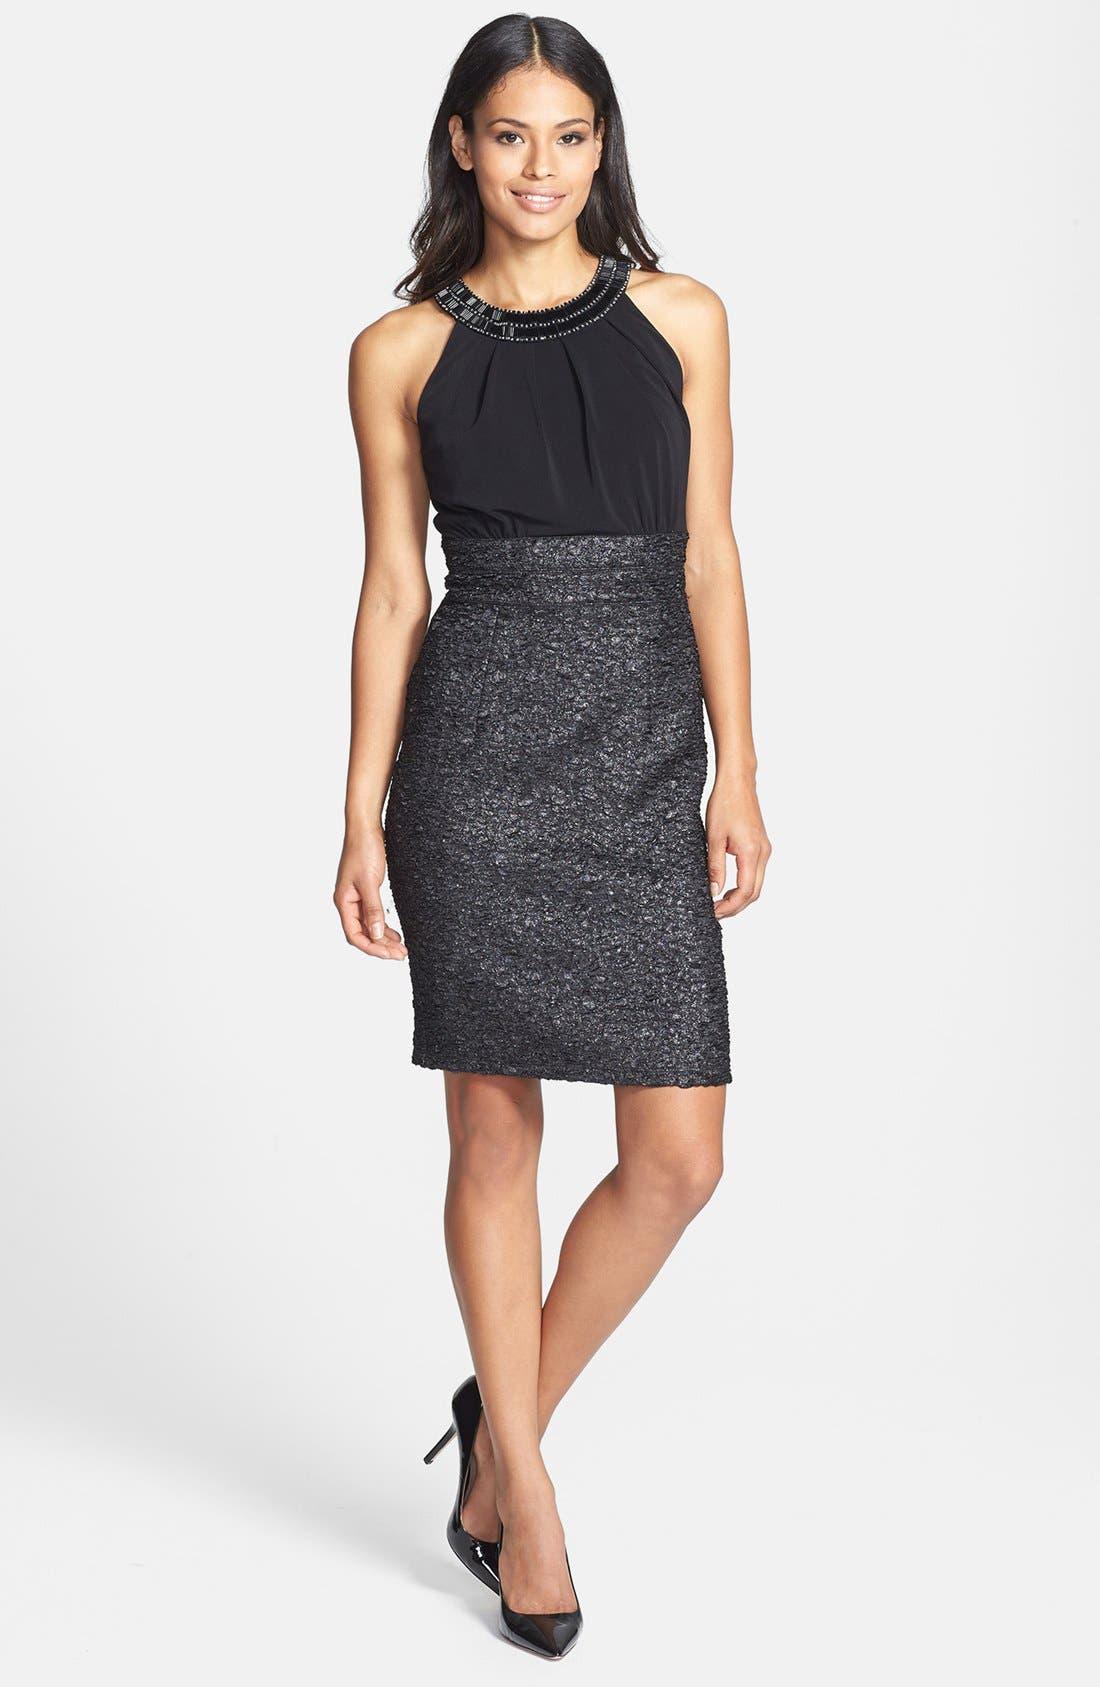 Alternate Image 1 Selected - Donna Ricco Beaded Neck Sleeveless Mixed Media Dress (Petite)